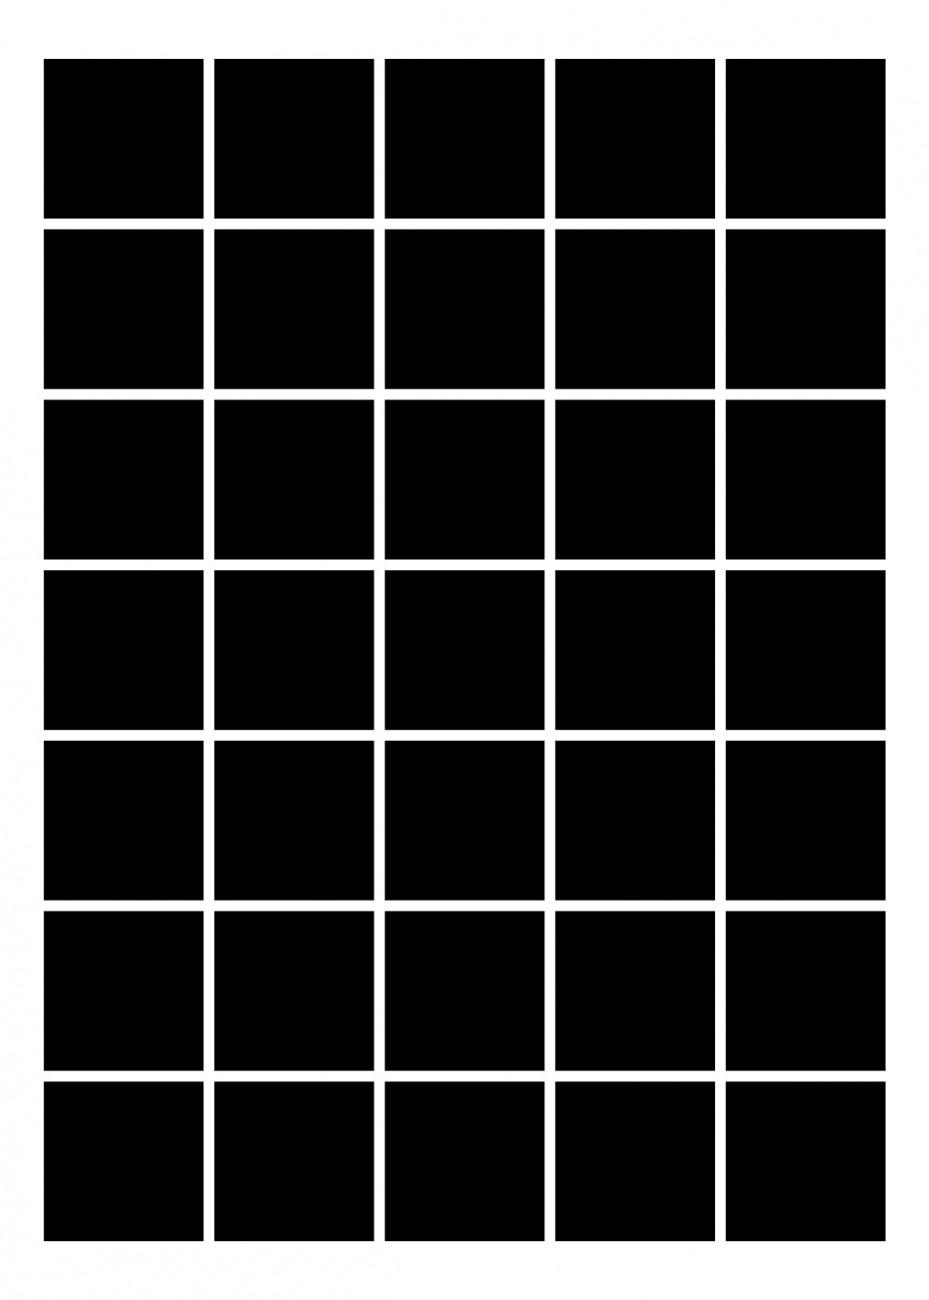 50x70 cm 02 - 35 bilder